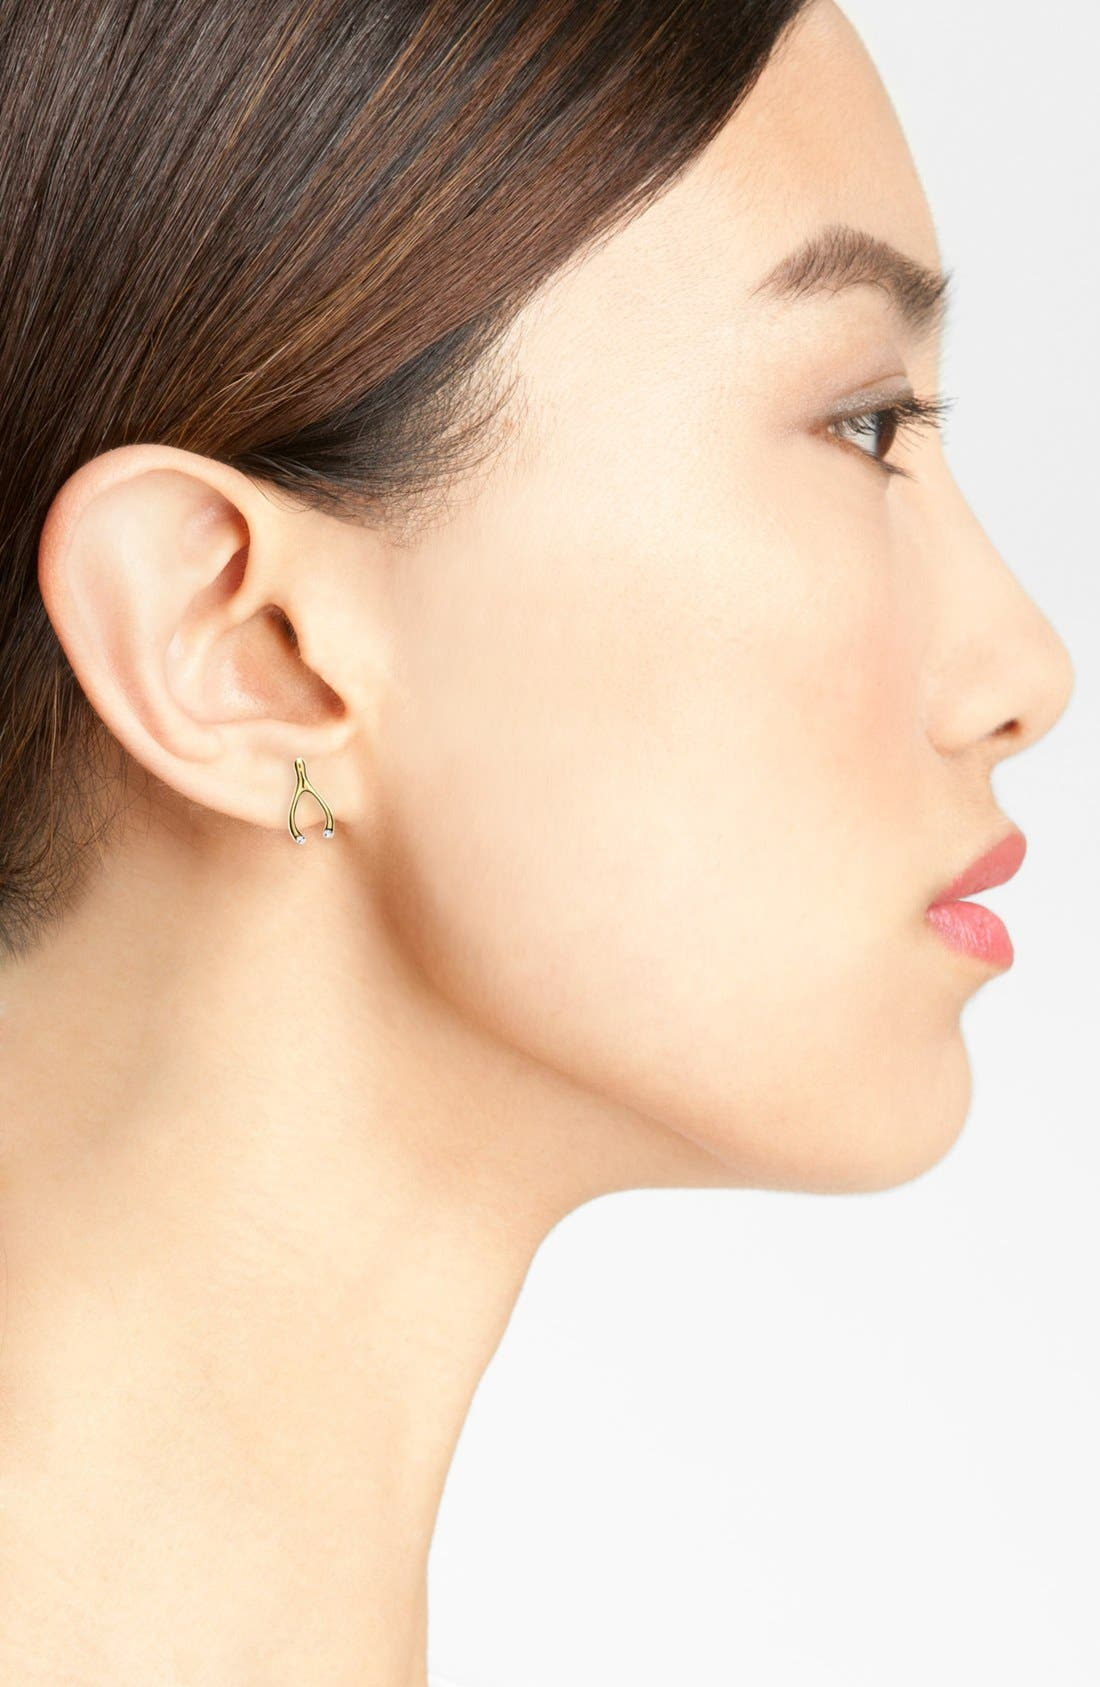 Alternate Image 2  - kate spade new york 'north court' wishbone & disc stud earrings (Set of 2)